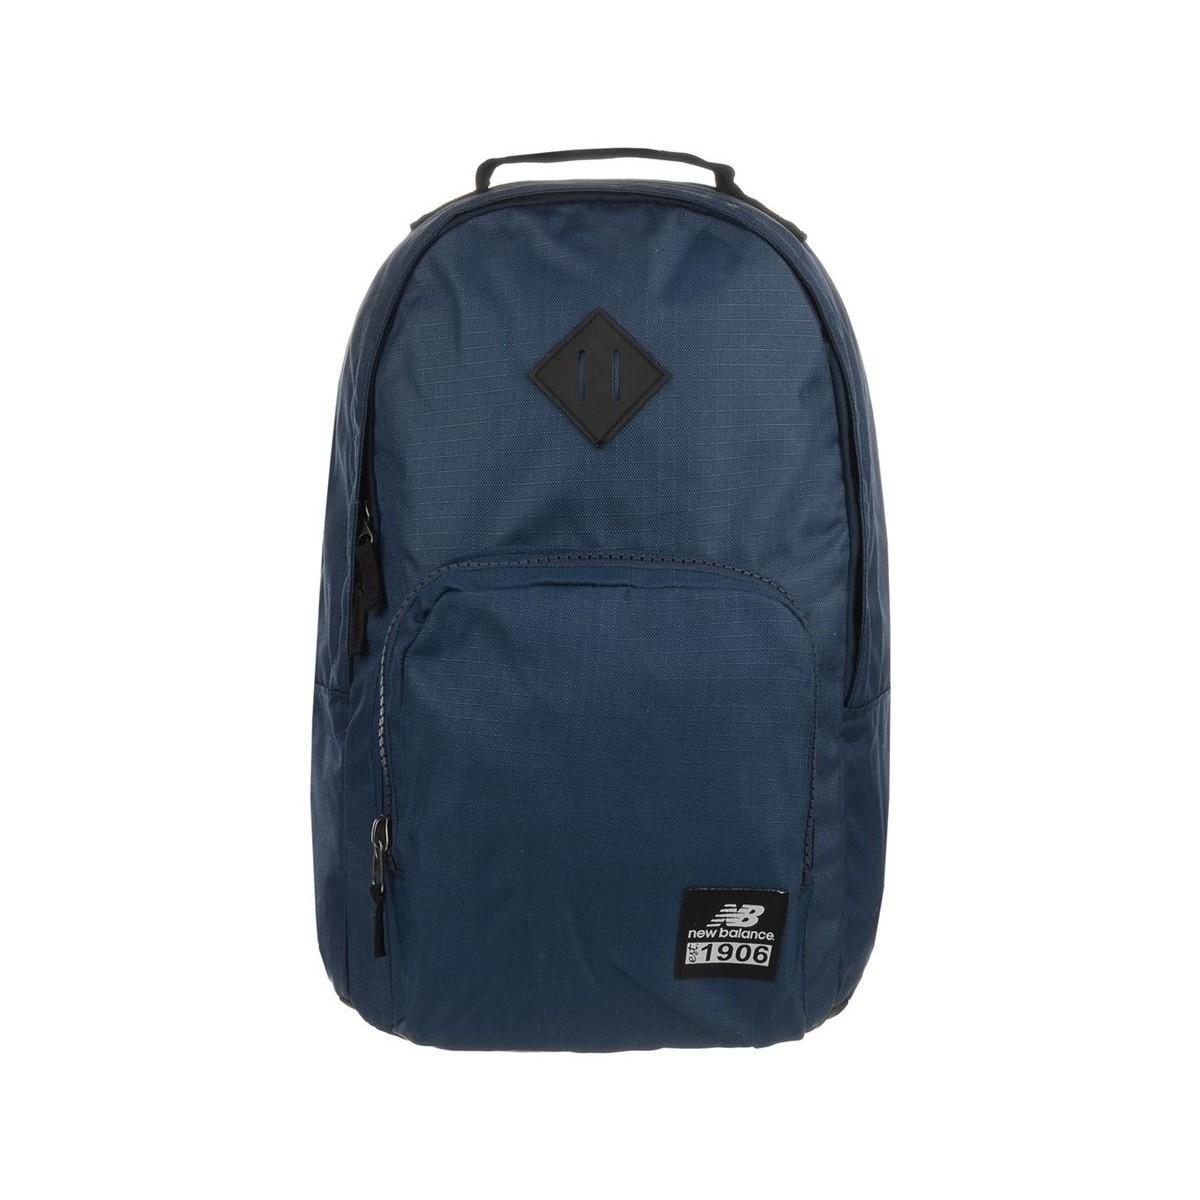 6cdfbc30436 New Balance Nb Men's Backpack In Multicolour in Blue for Men - Lyst